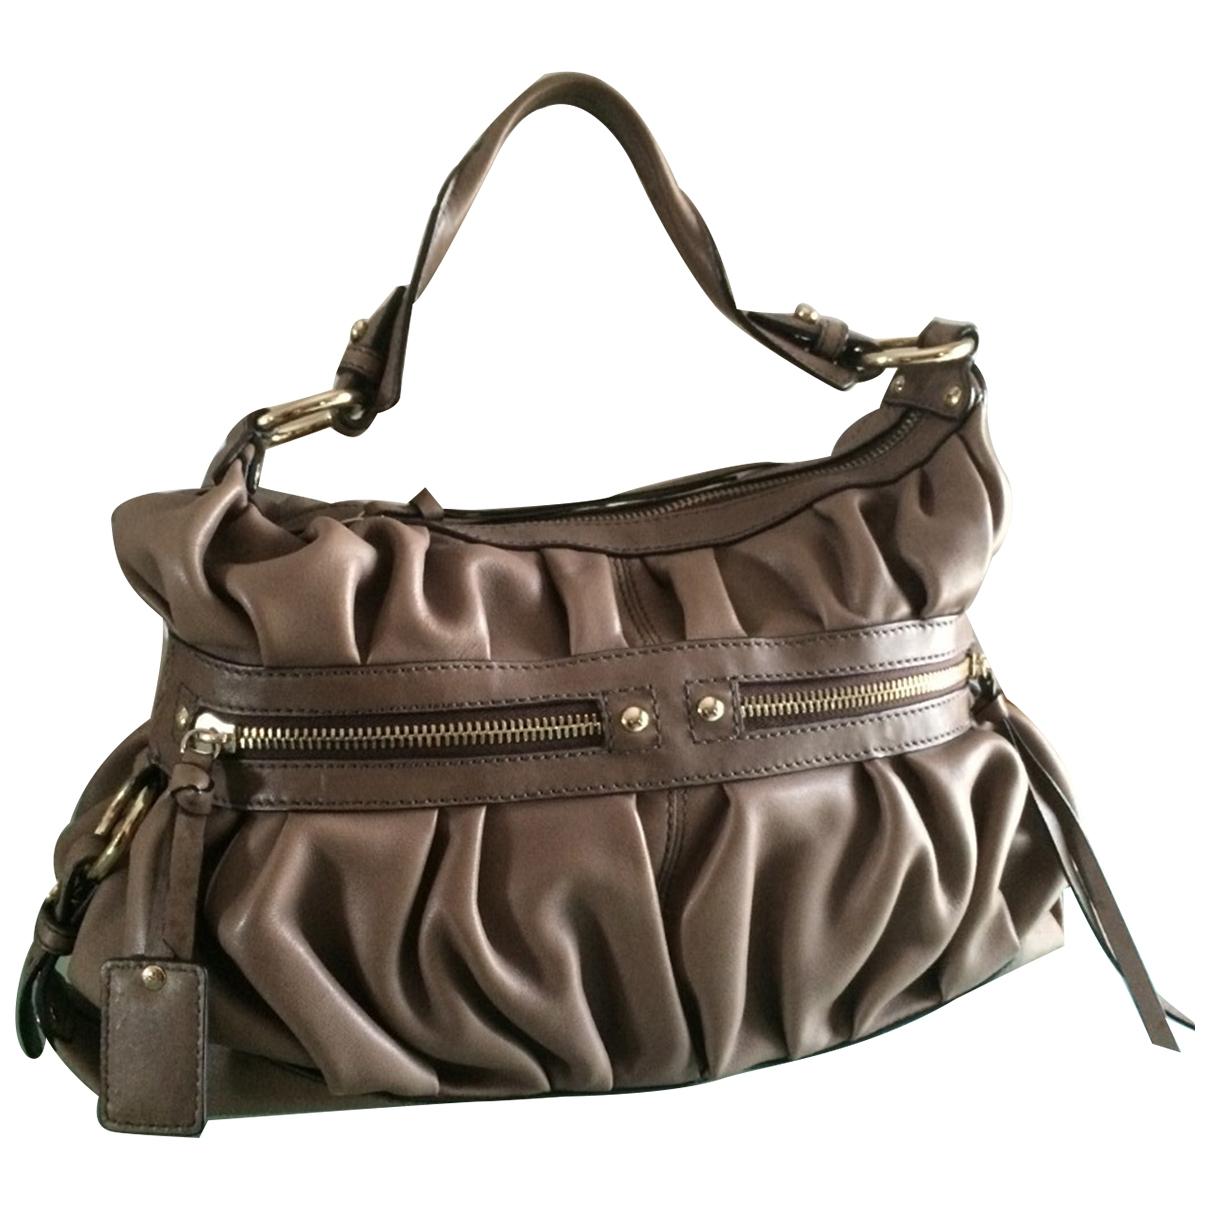 Coccinelle \N Khaki Leather handbag for Women \N